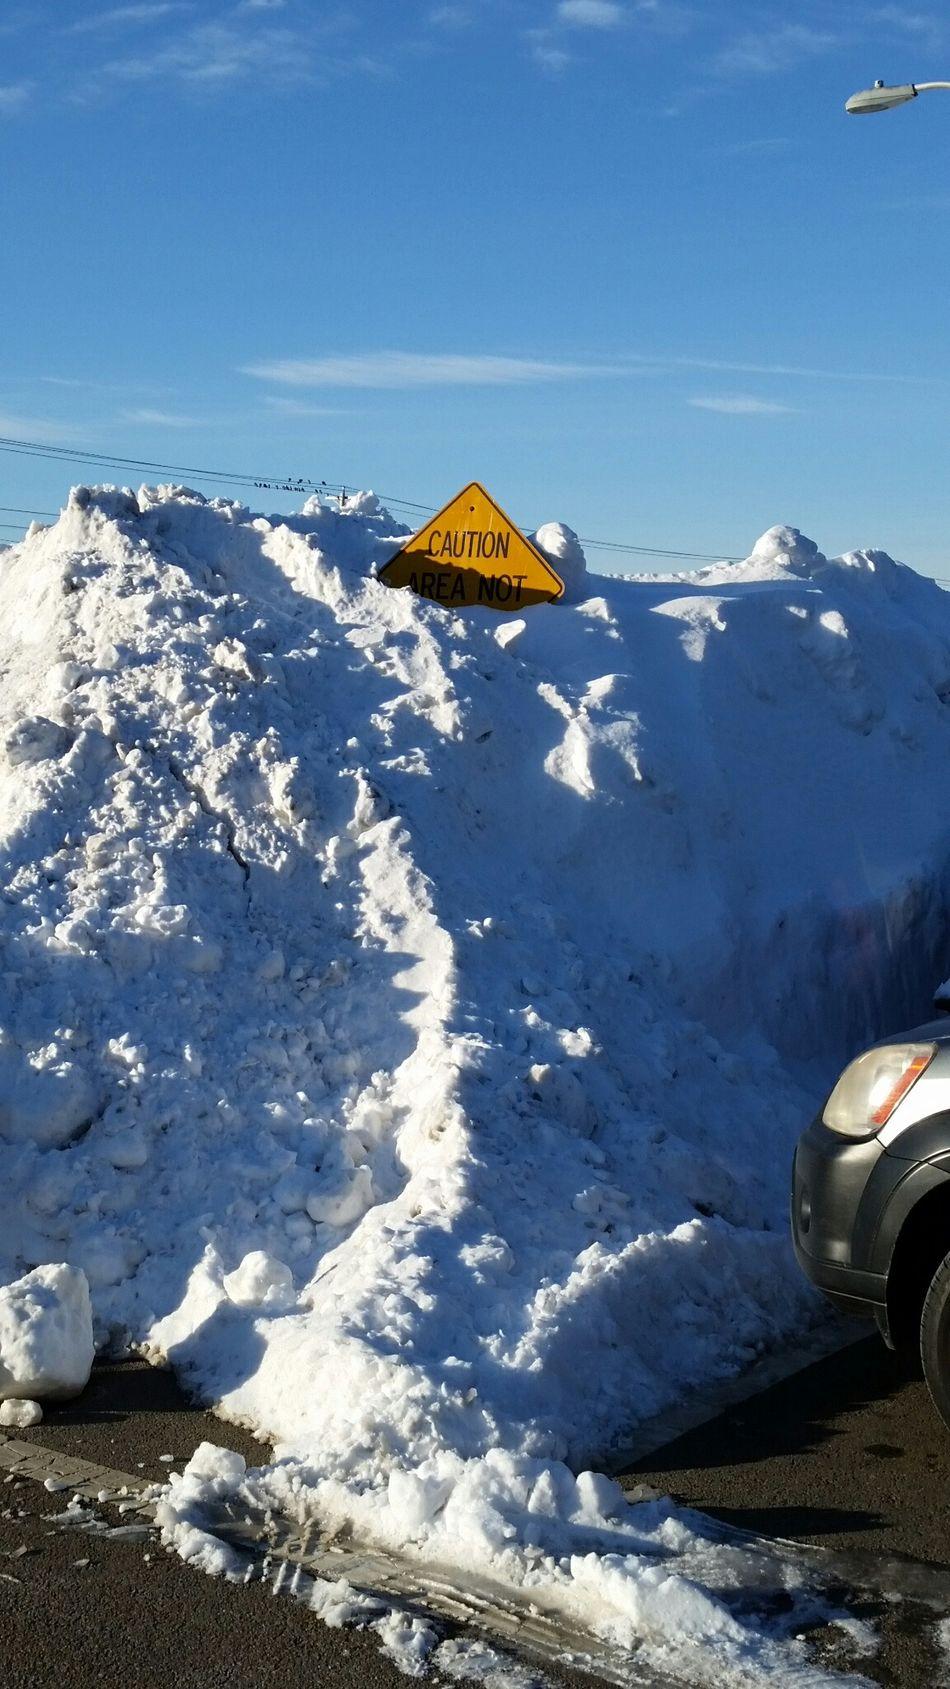 """CAUTION: AREA NOT SALTED"" Humor Humour Snow Mountain Snow Snow ❄ Snowfall Signs Signpost Southeastern Massachusetts Massachusetts South Shore Rockland, Massachusetts"